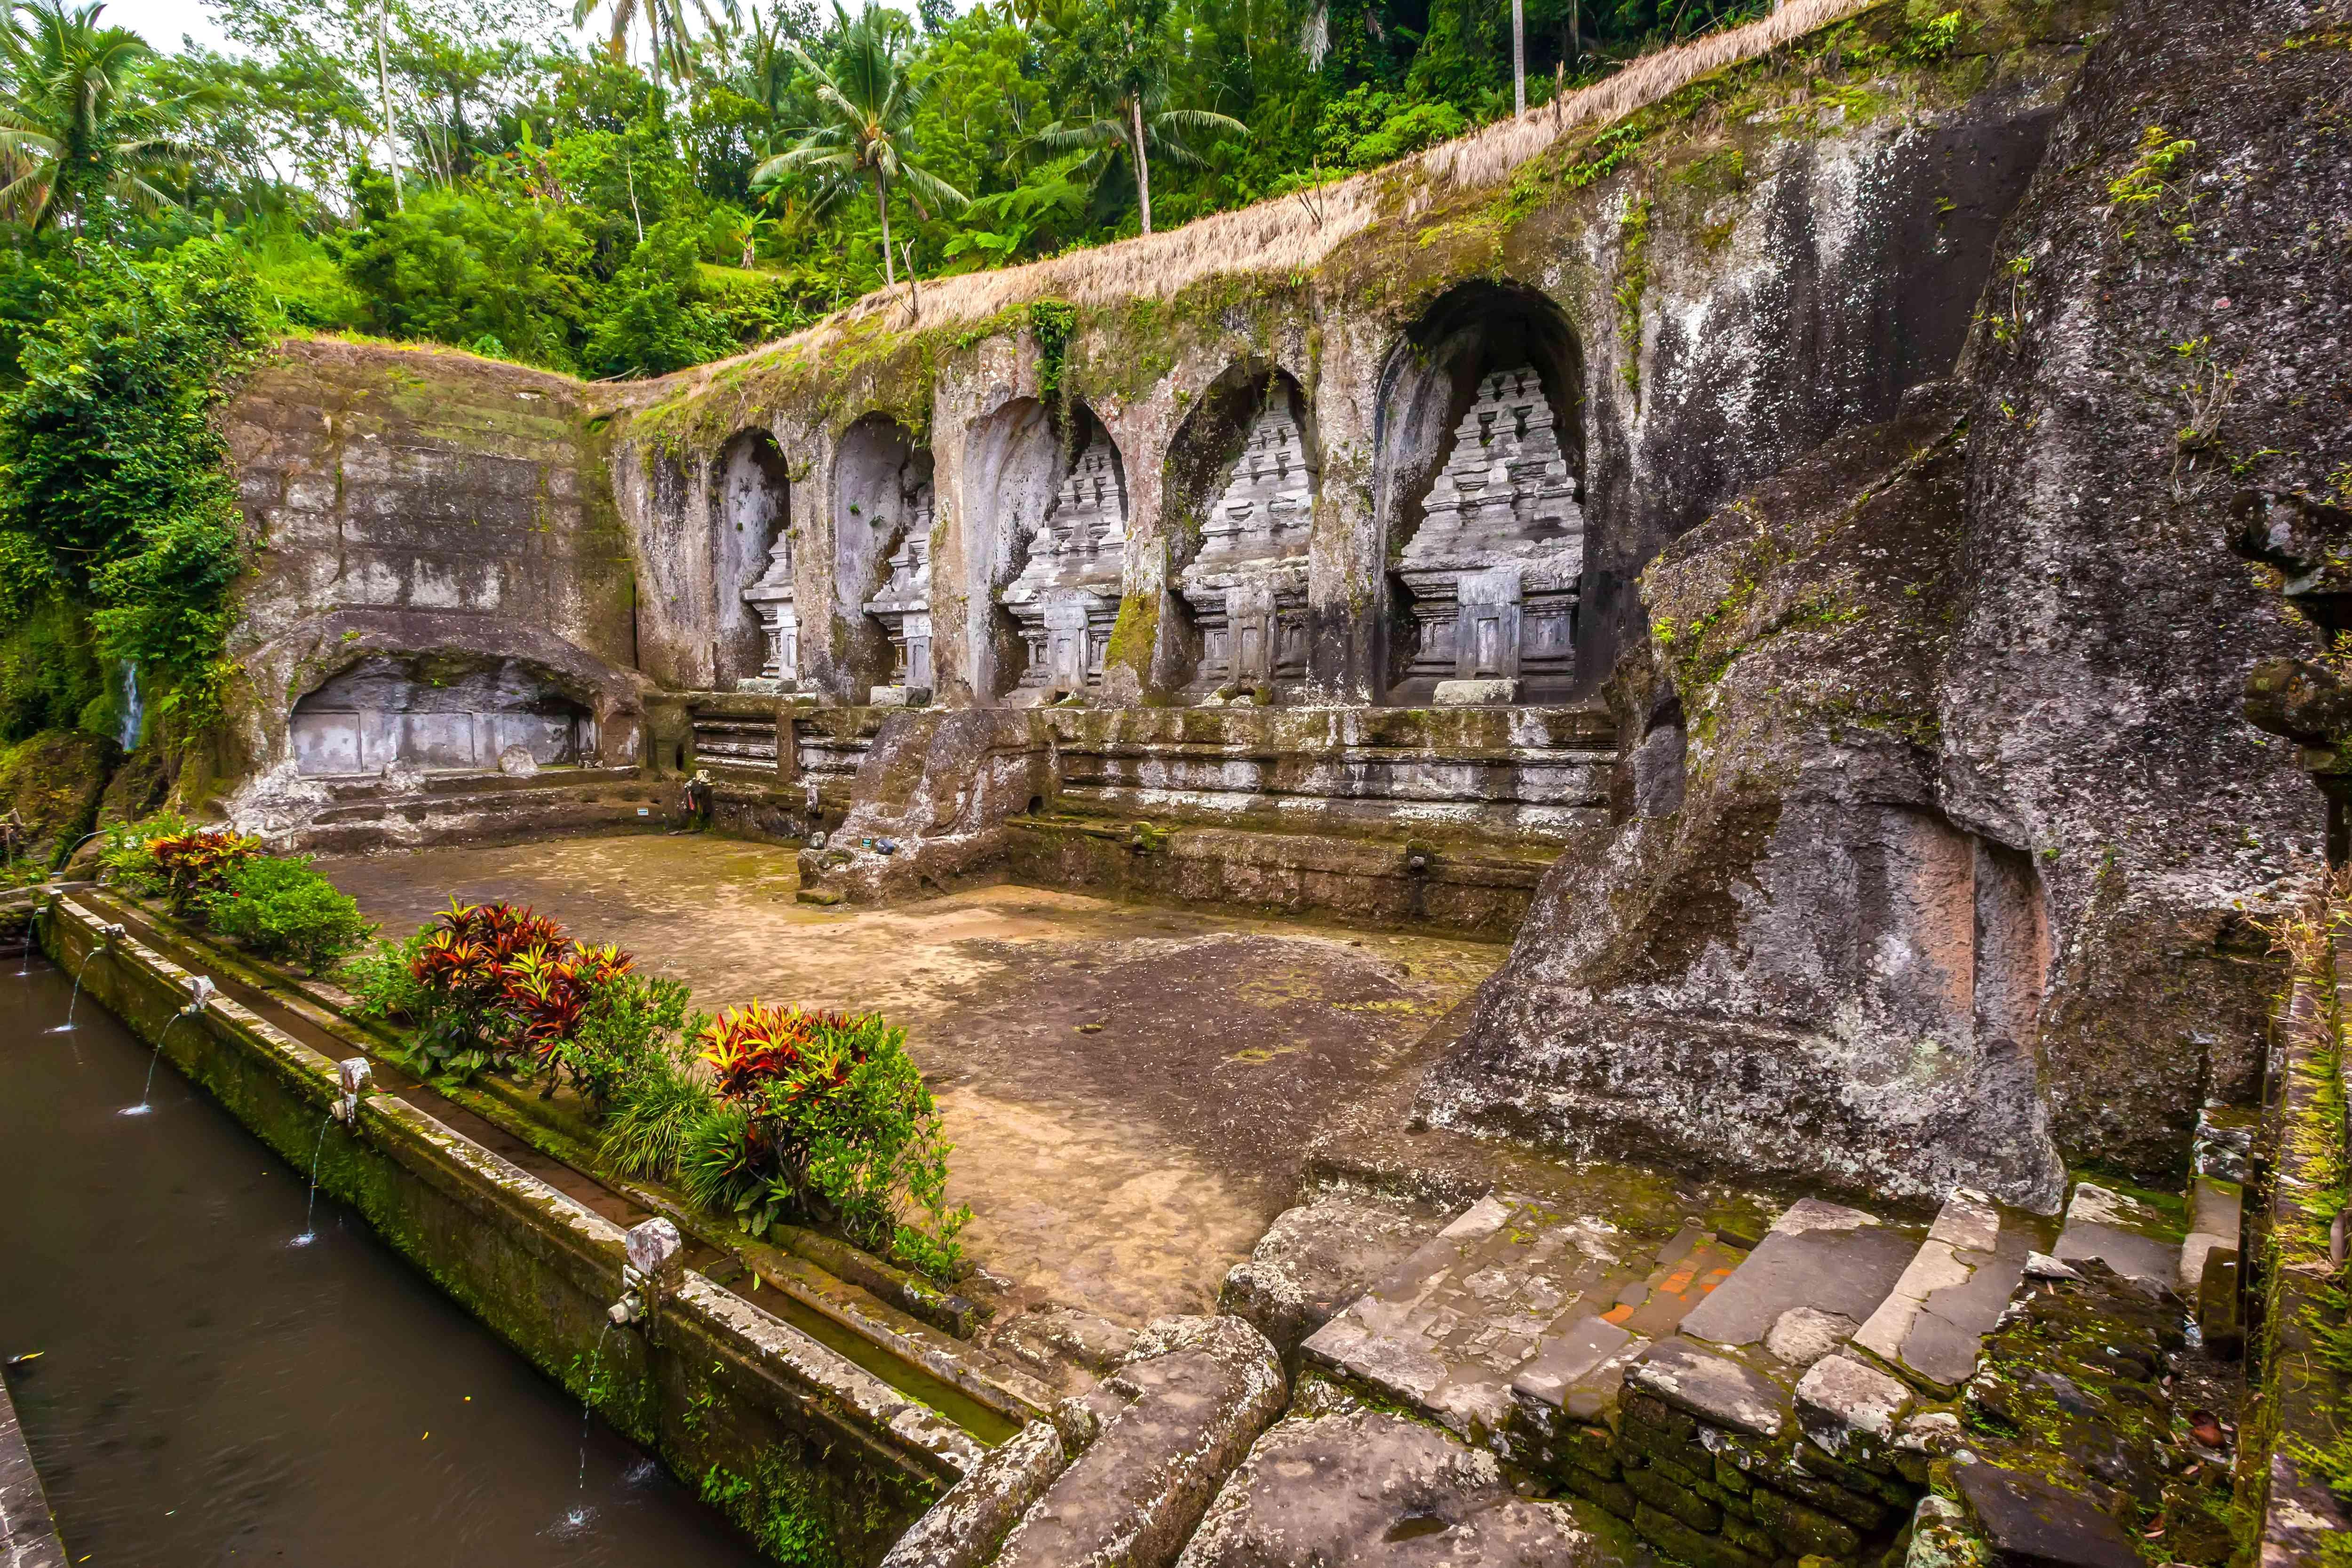 Pura Gunung Kawi in Bali, Indonesia